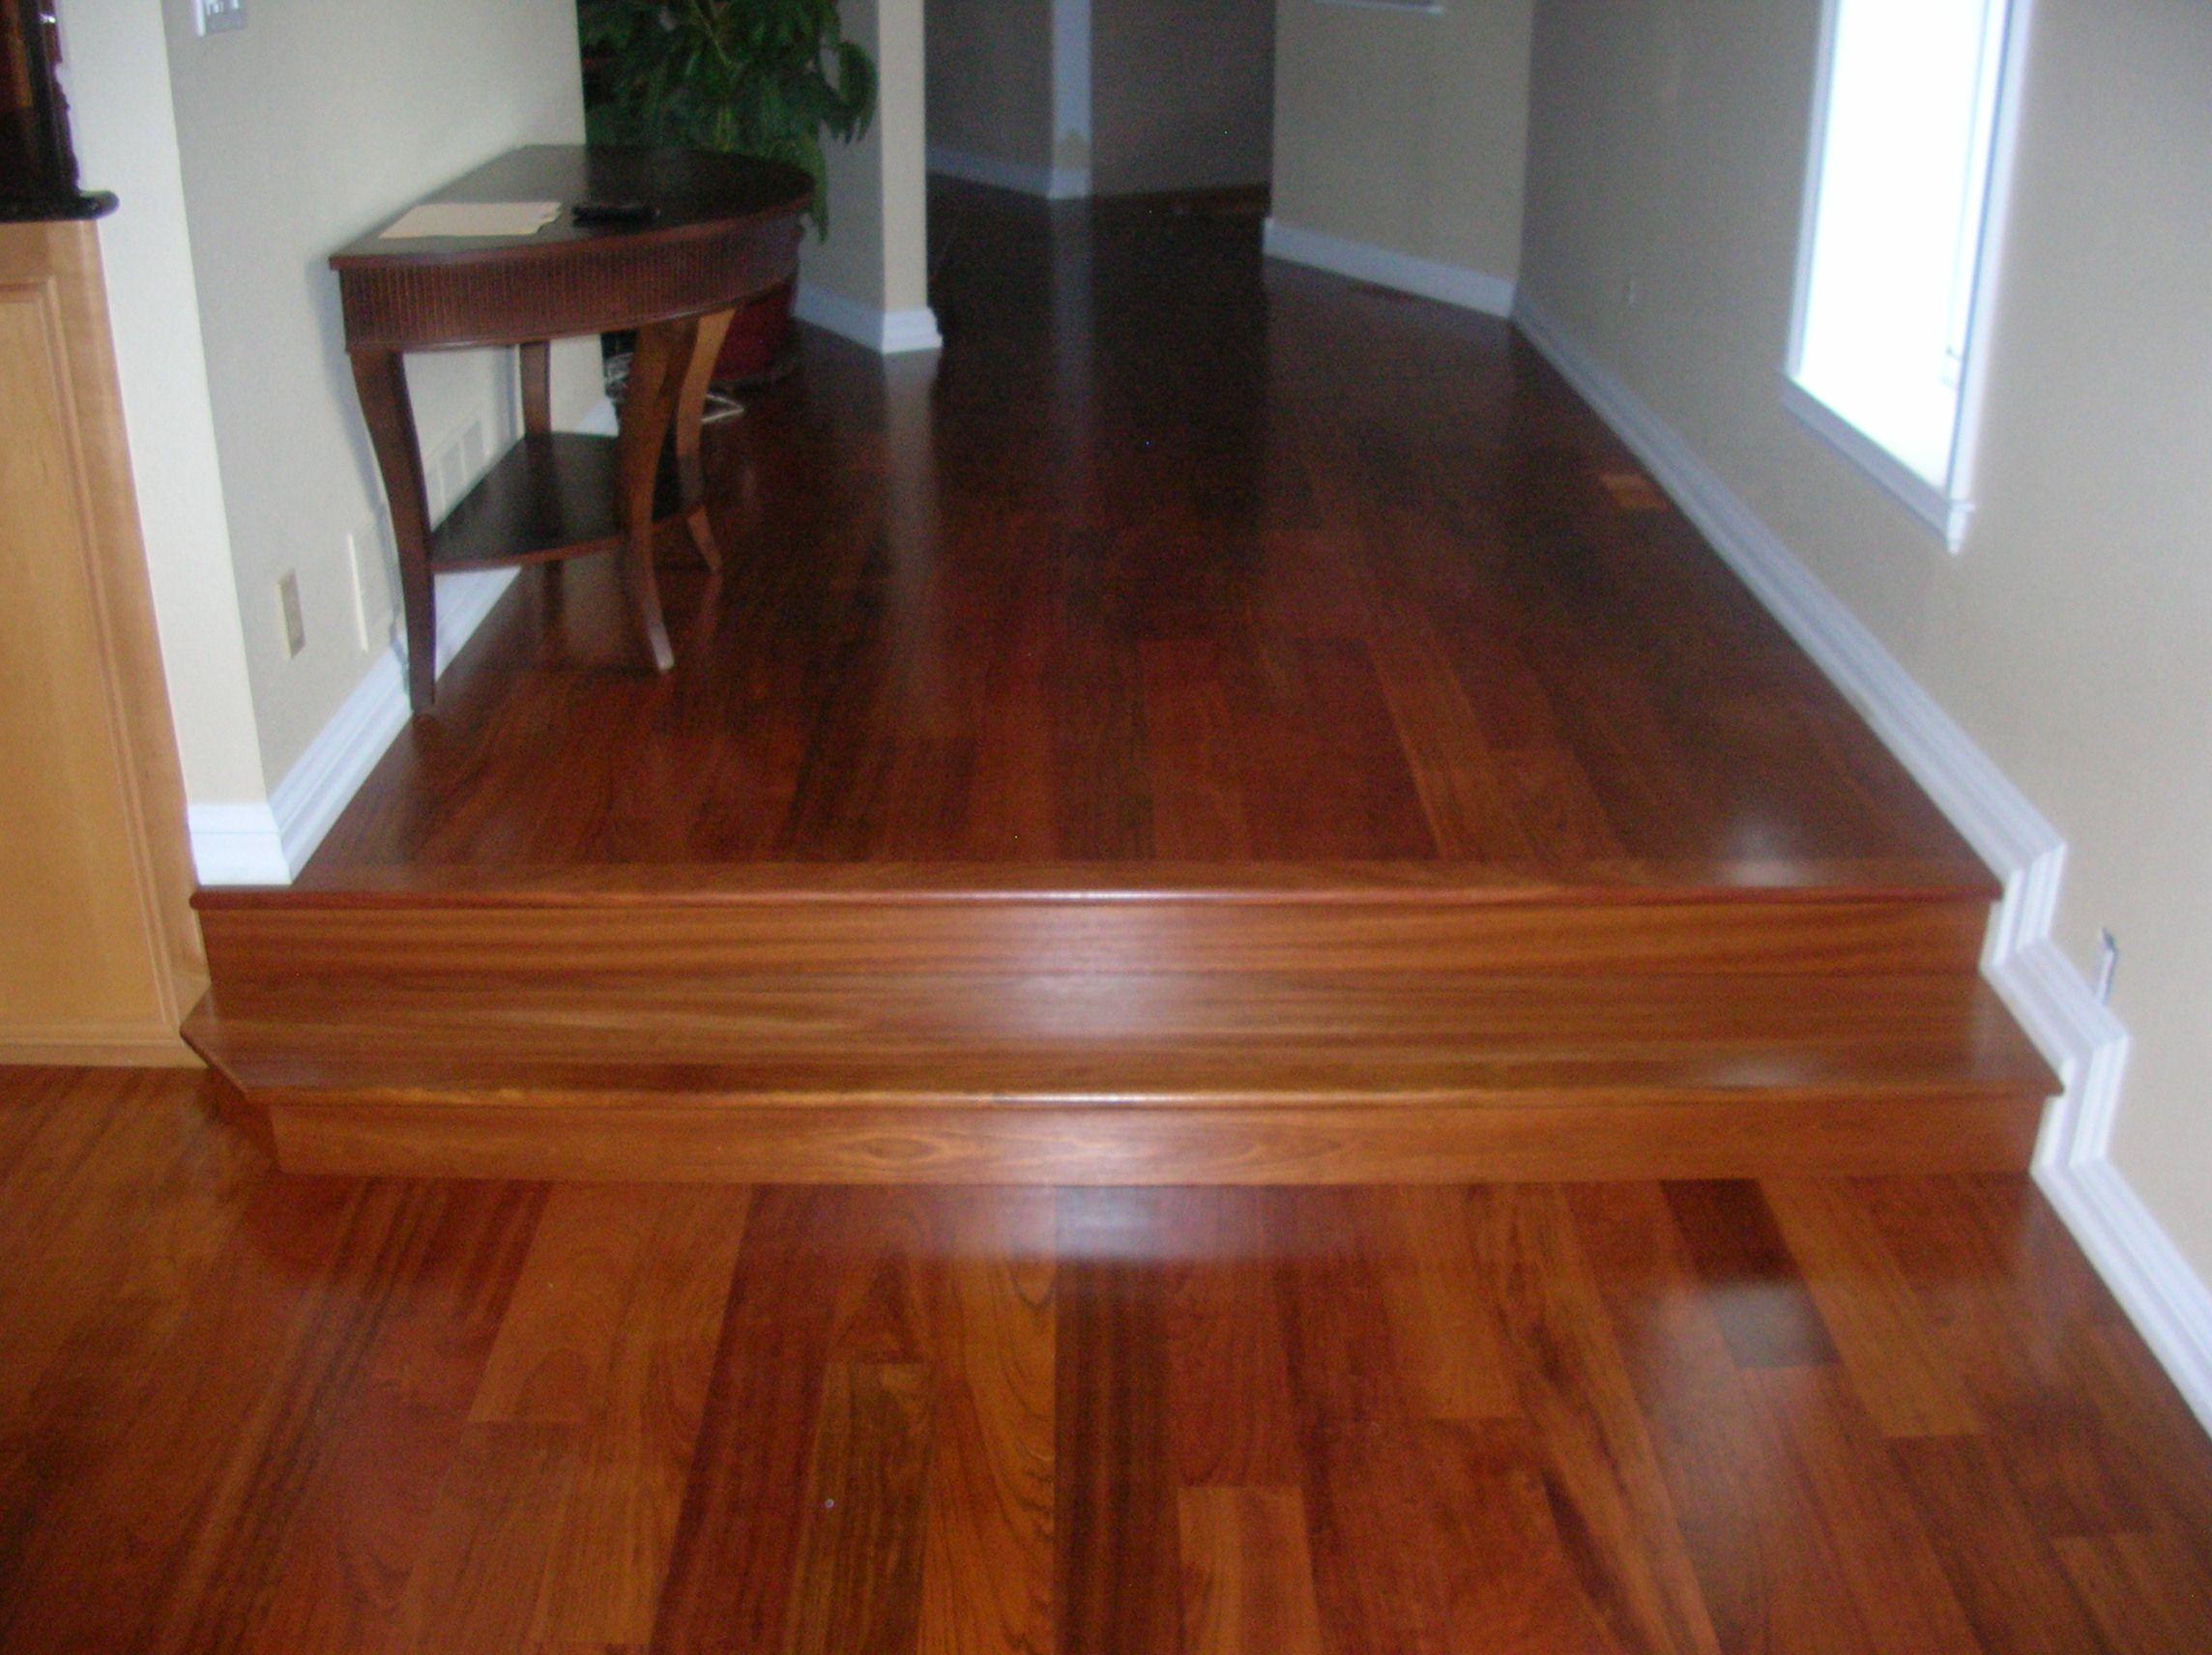 Kendall S Custom Wood Floors And Steps Inc Home Services Request A Free Estimate Contact Us Brazillian Cherry Hardwood Floors Hickory Hardwood Floors